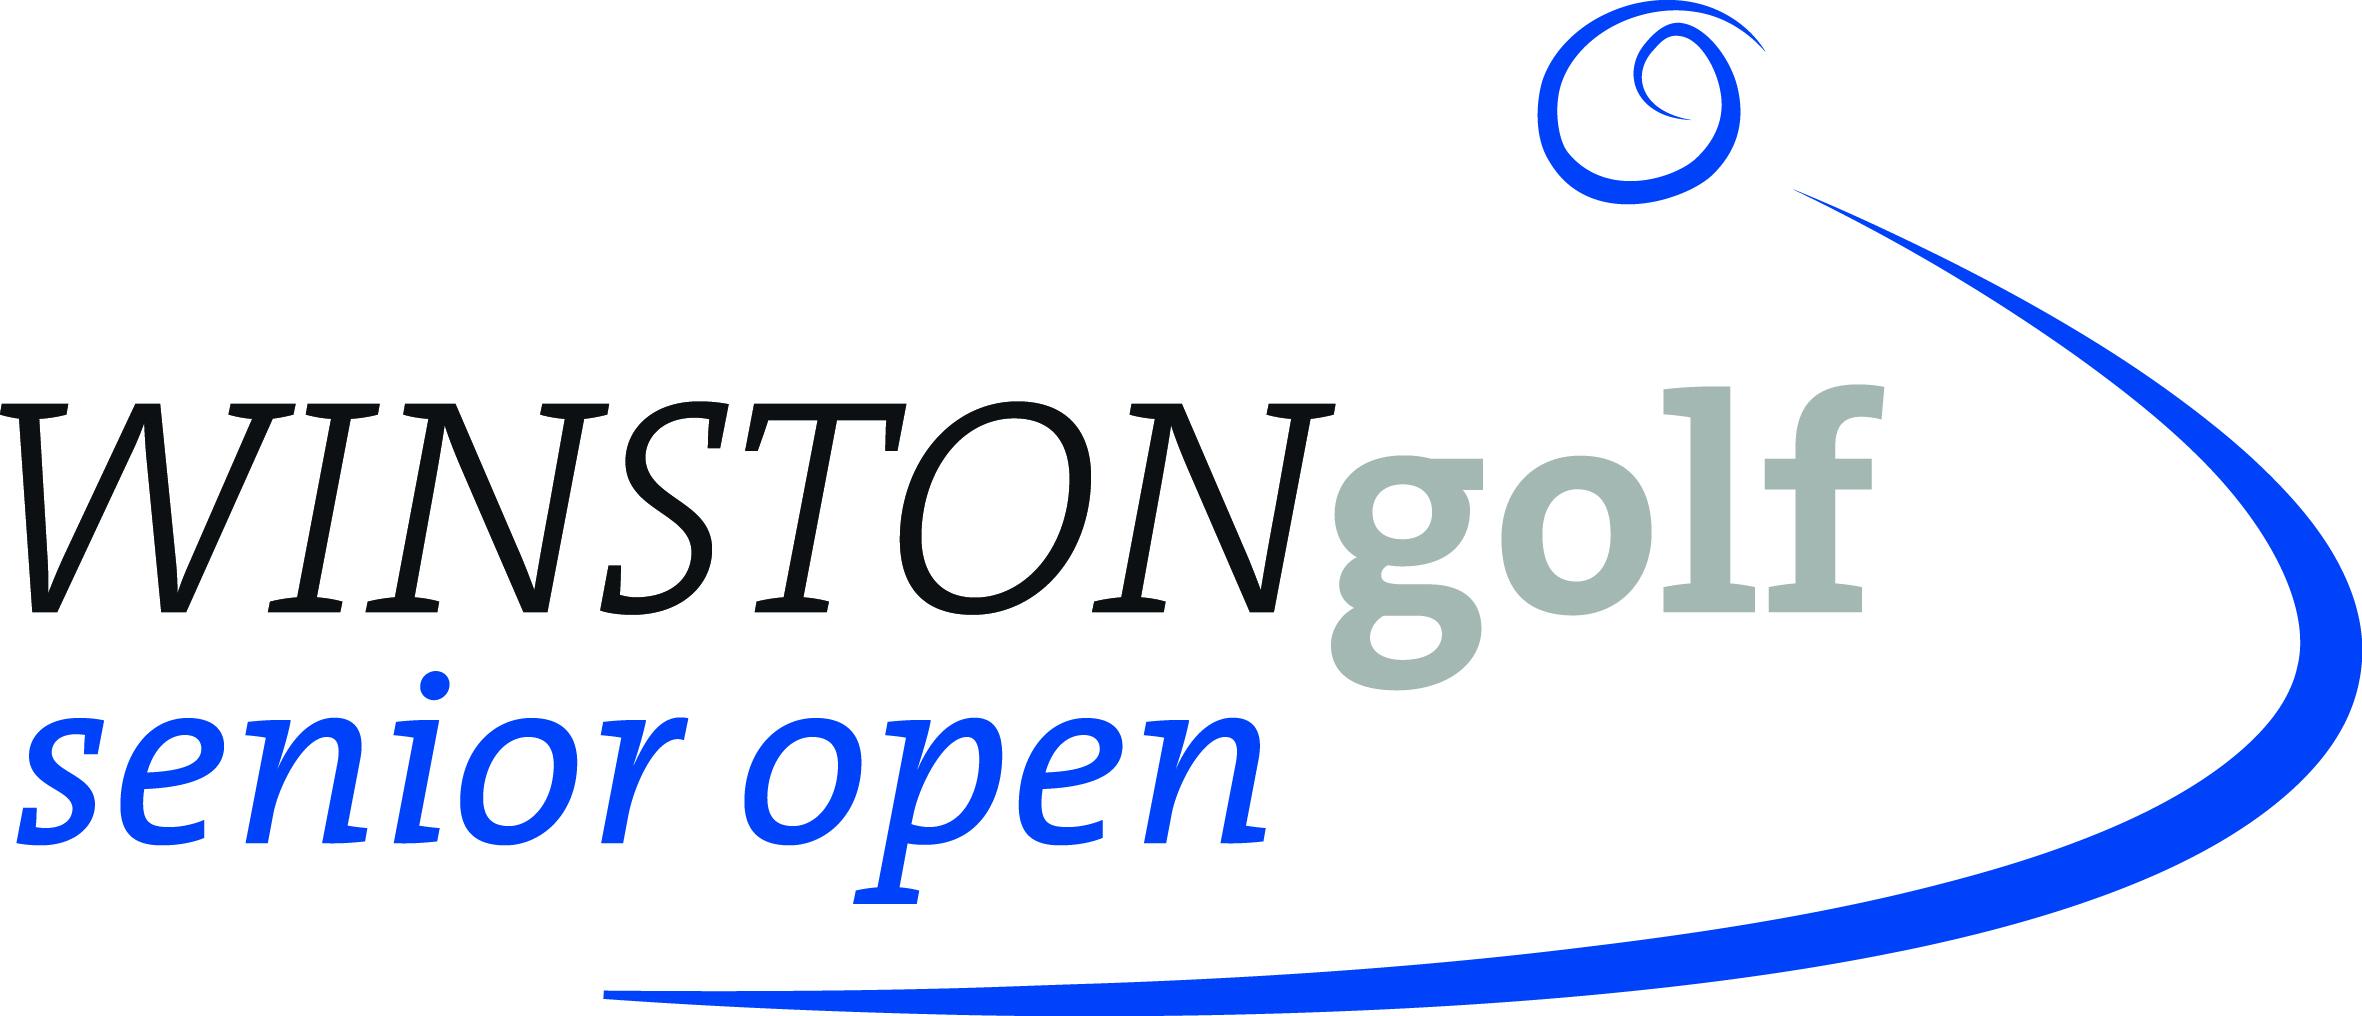 WINSTONgolf Senior Open